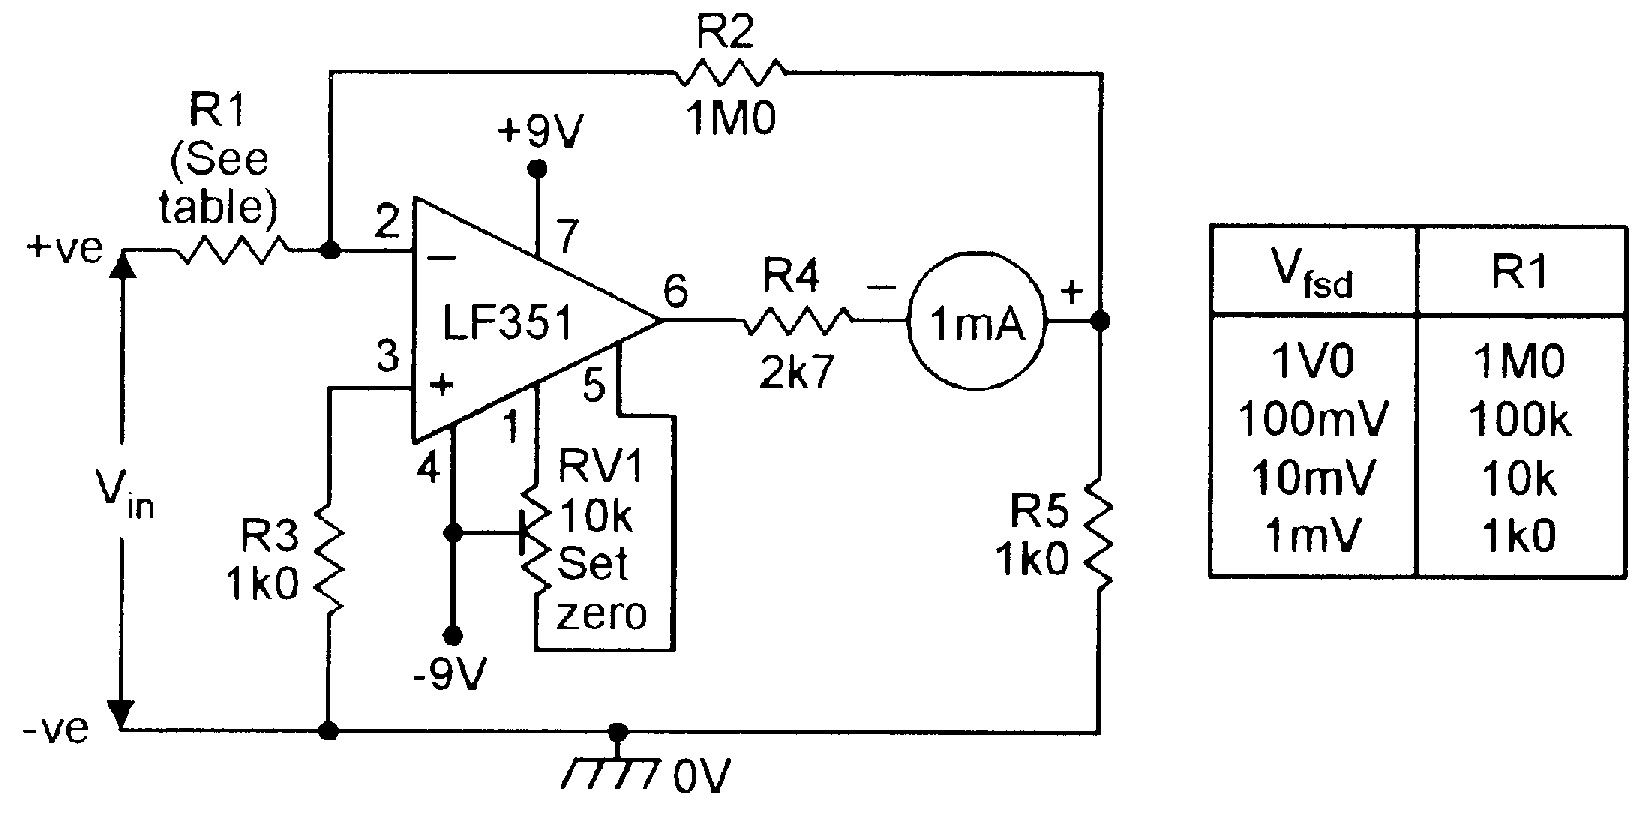 a dc millivoltmeter circuit electronic schematics circuit diagram electronics projects circuits  [ 1650 x 822 Pixel ]